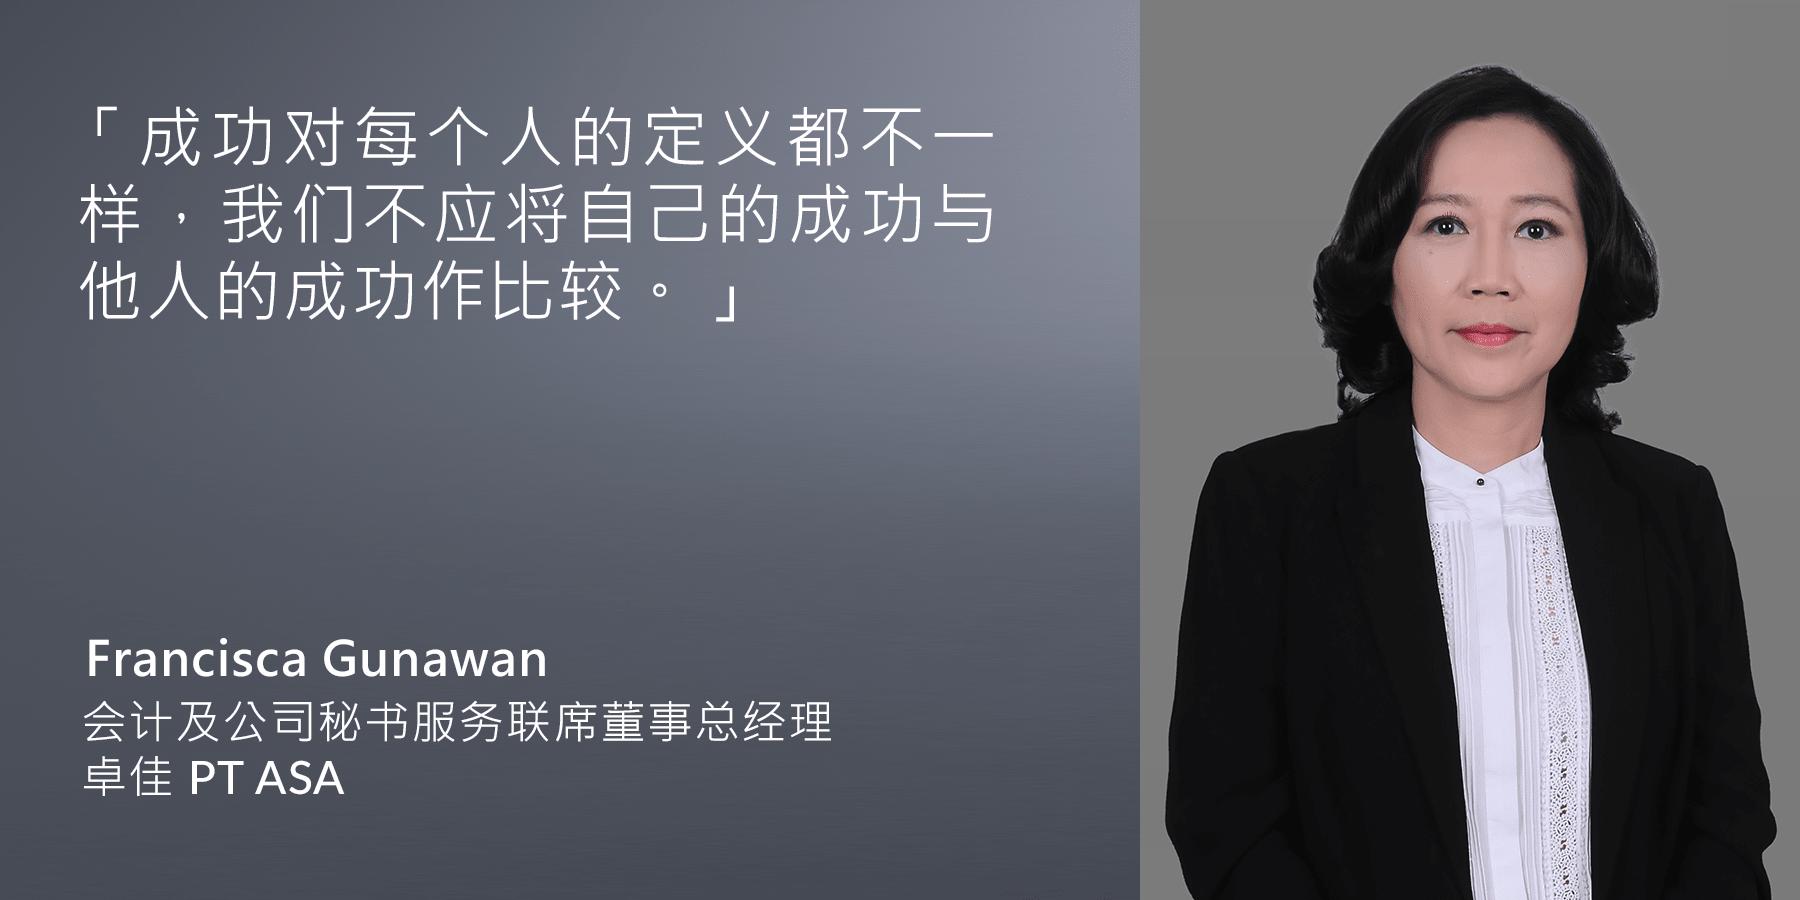 Francisca Gunawan - 会计及公司秘书服务联席董事总经理 - 卓佳 PT ASA